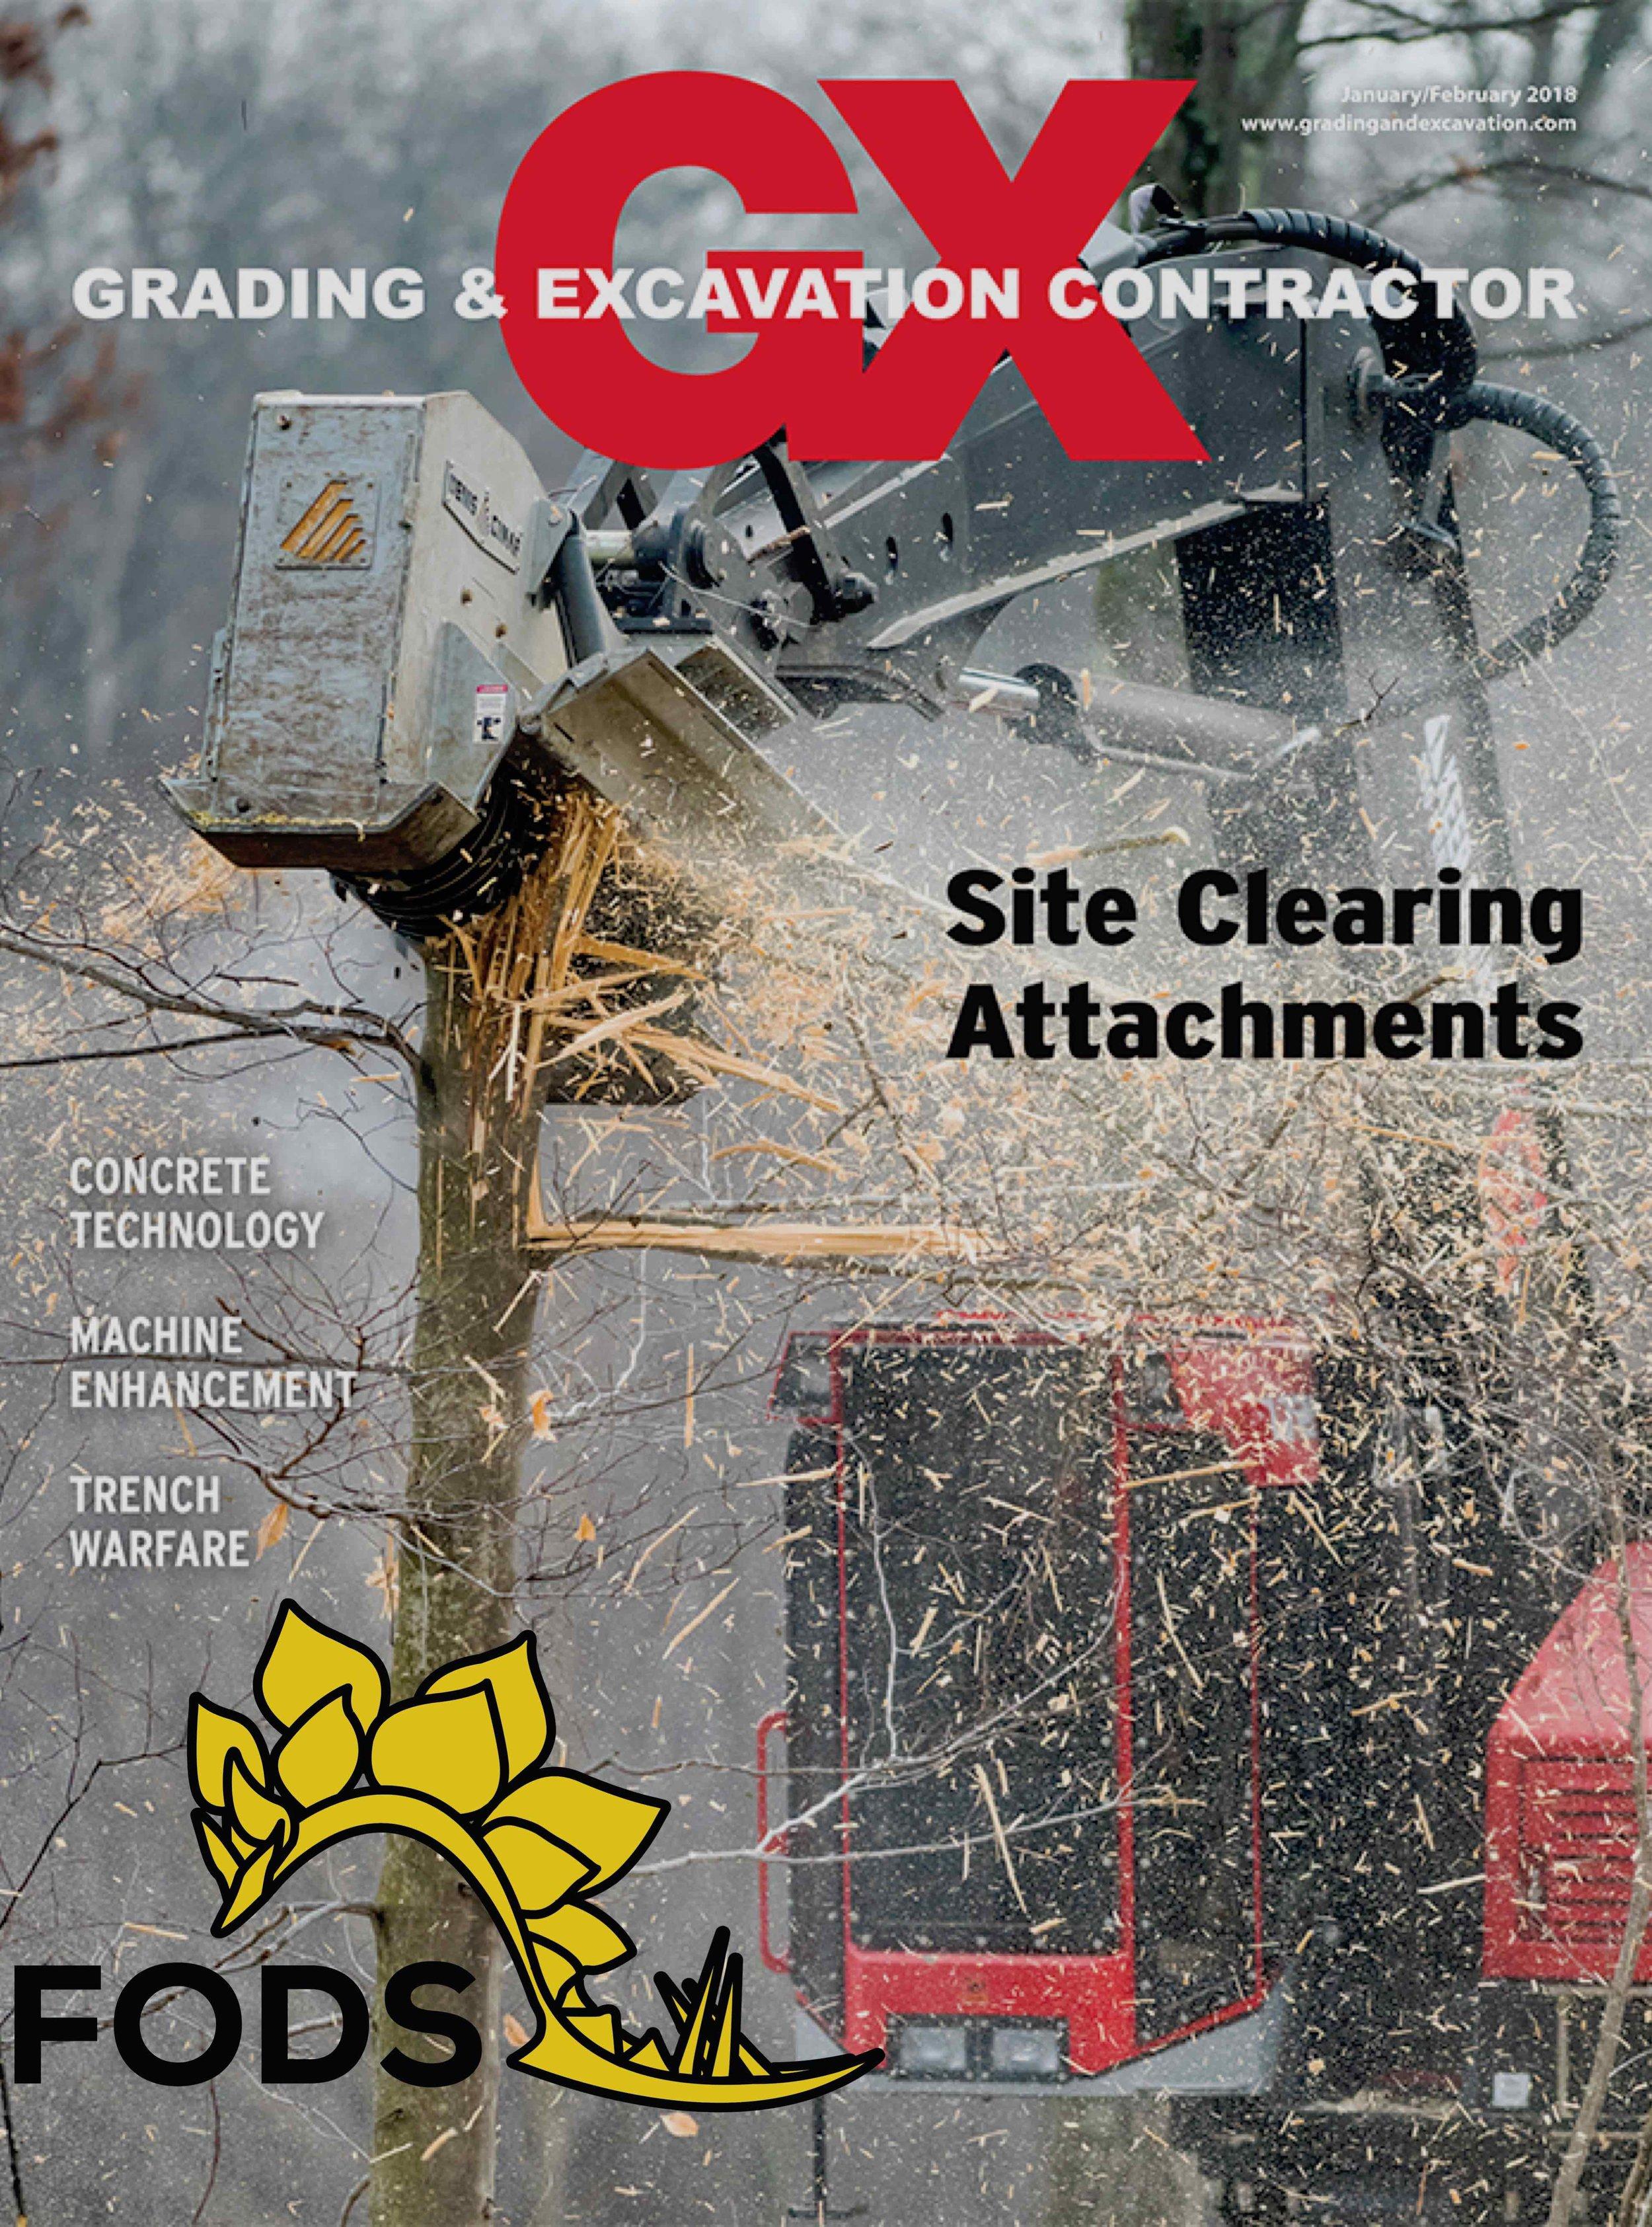 FODS_Balfour_Beatty_RTD_TC-1_TRACKOUT CONROL_ STABILIZED CONSTRUCTION ENTRANCE_VTC_1.jpg